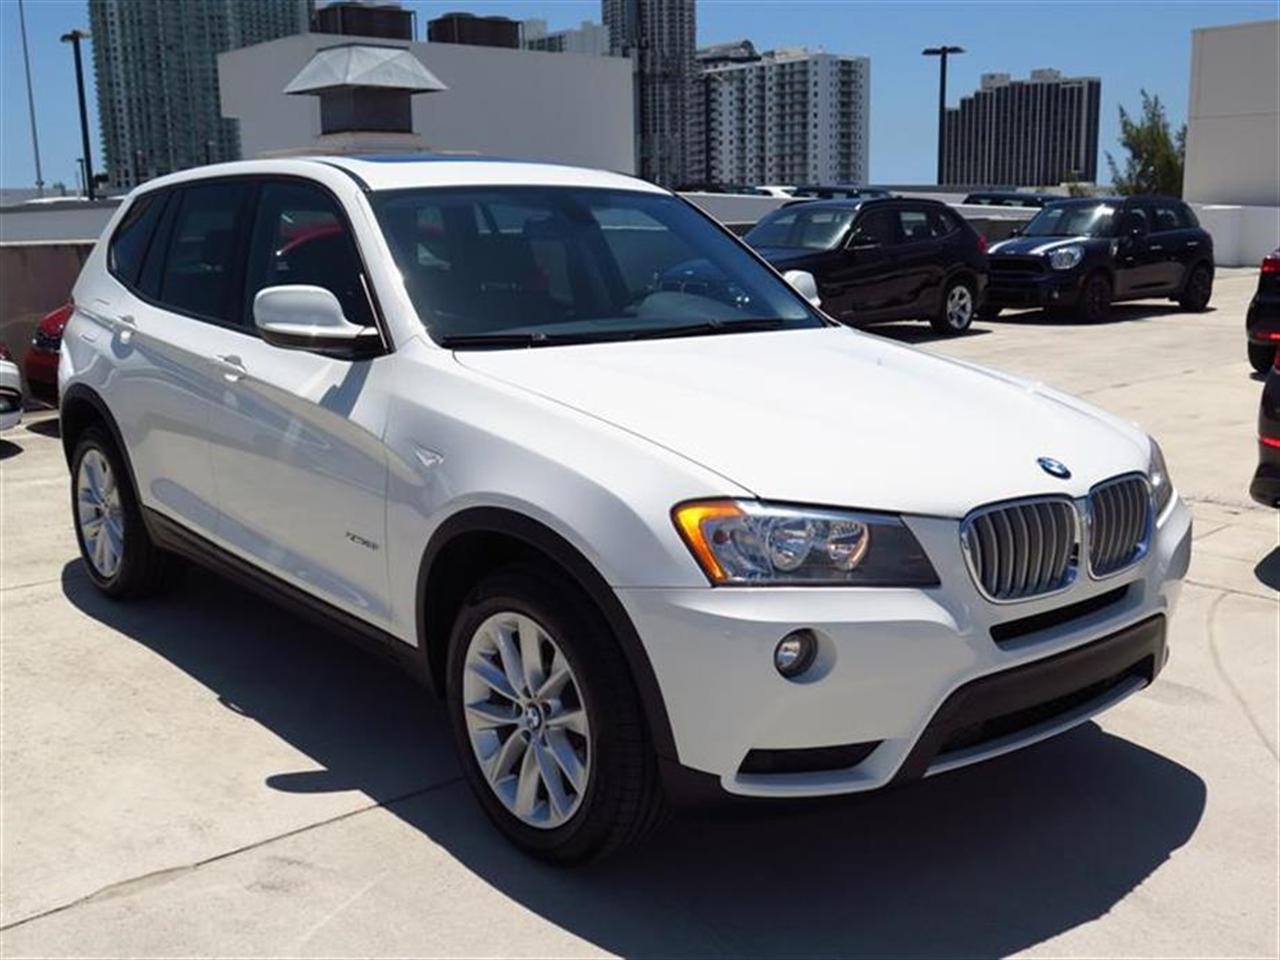 2014 BMW X3 AWD 4dr xDrive28i 18768 miles 2 Seatback Storage Pockets 3 12V DC Power Outlets 40-